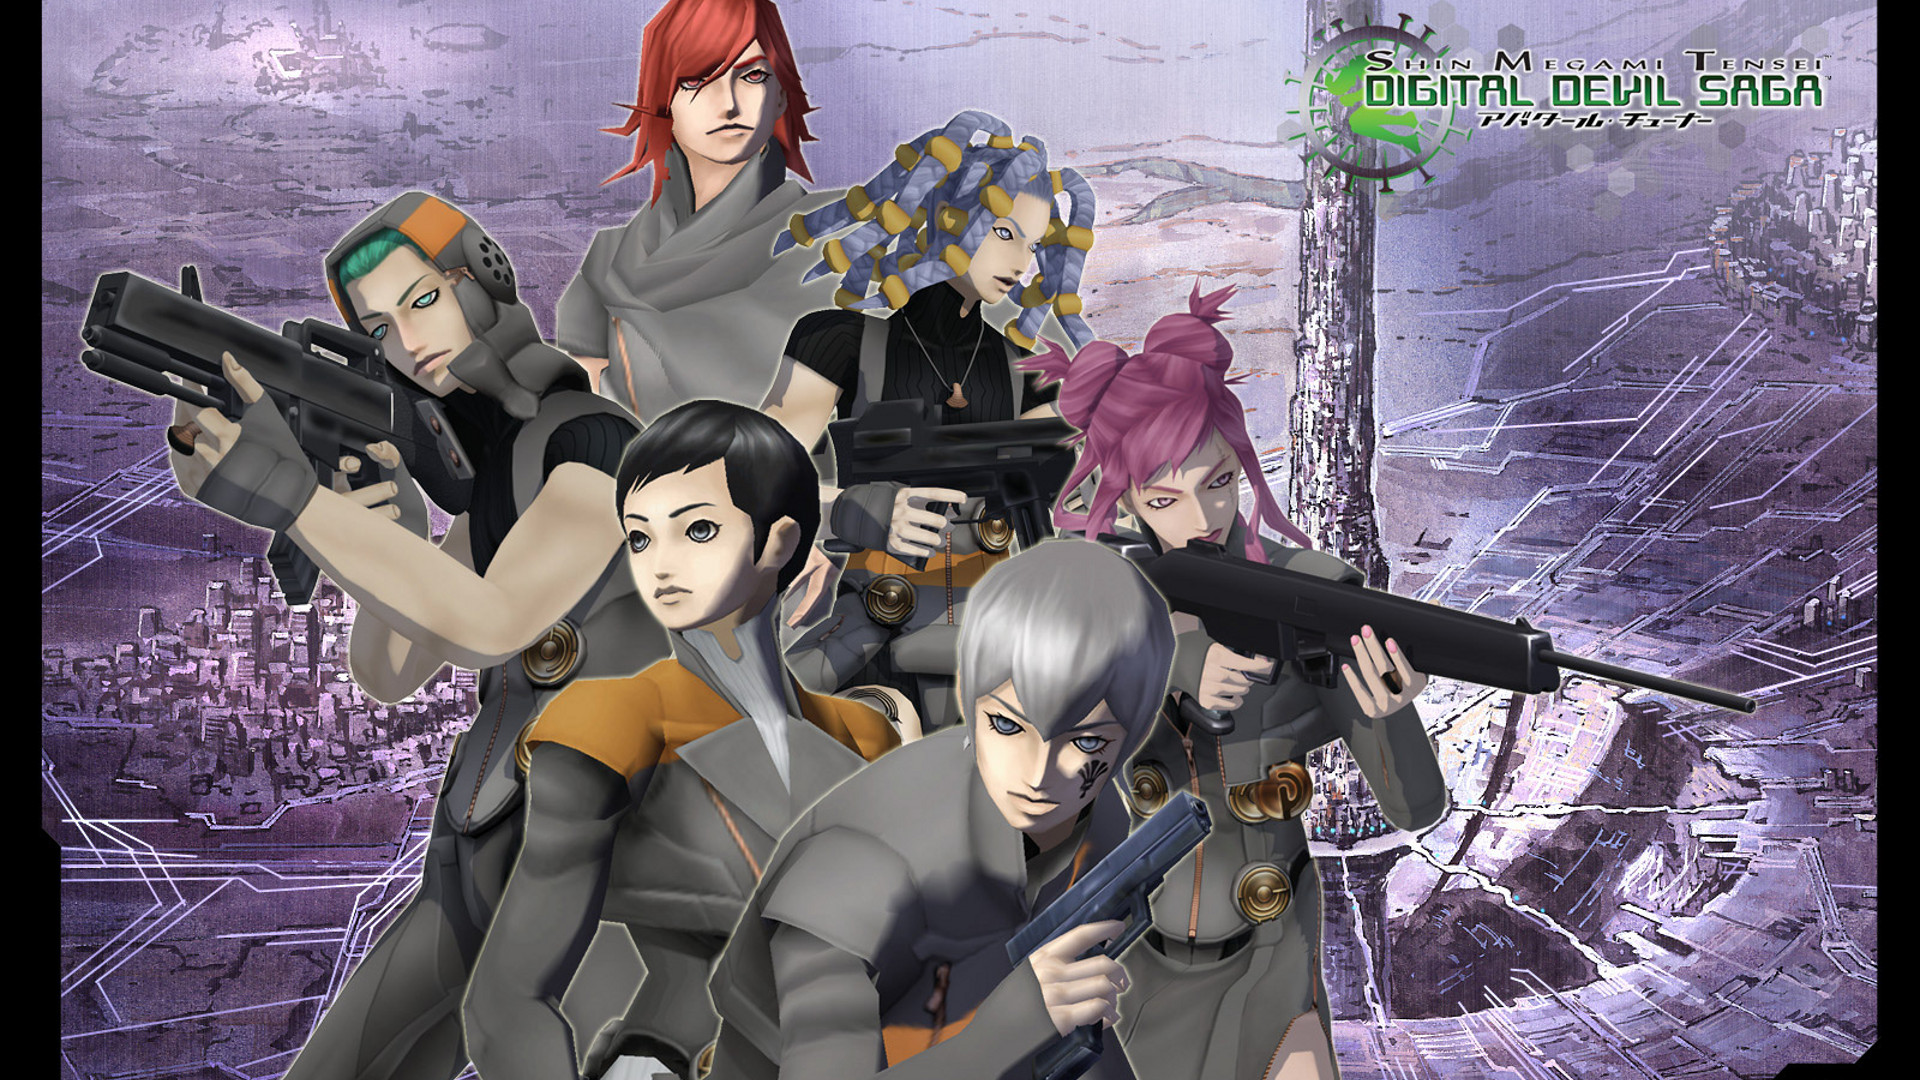 3d Wallpaper Download App Shin Megami Tensei Digital Devil Saga Details Launchbox